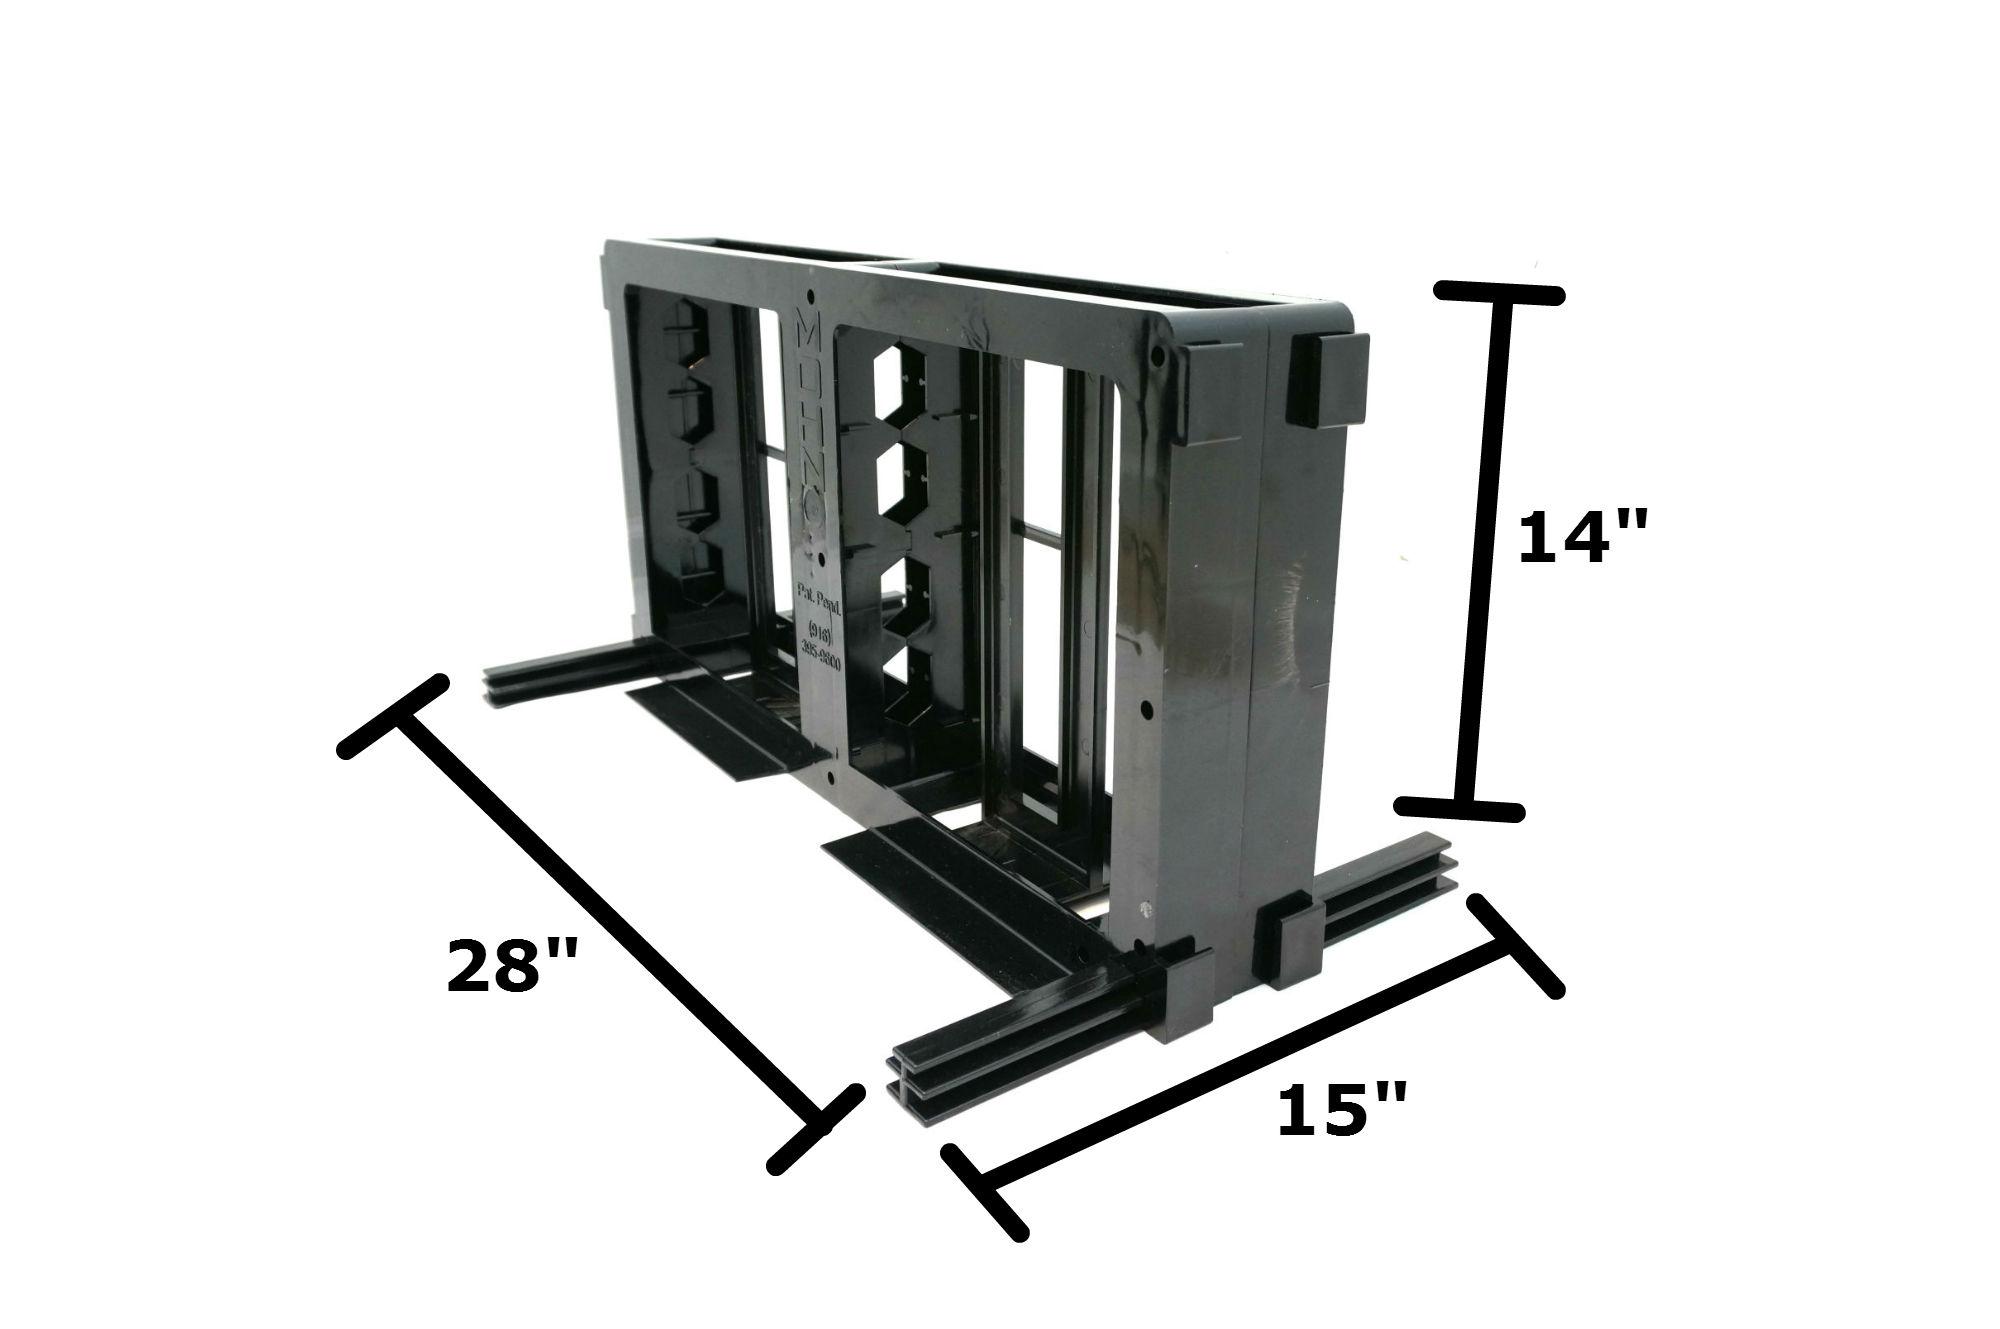 freestanding-snowboard-rack-dimensions.jpg